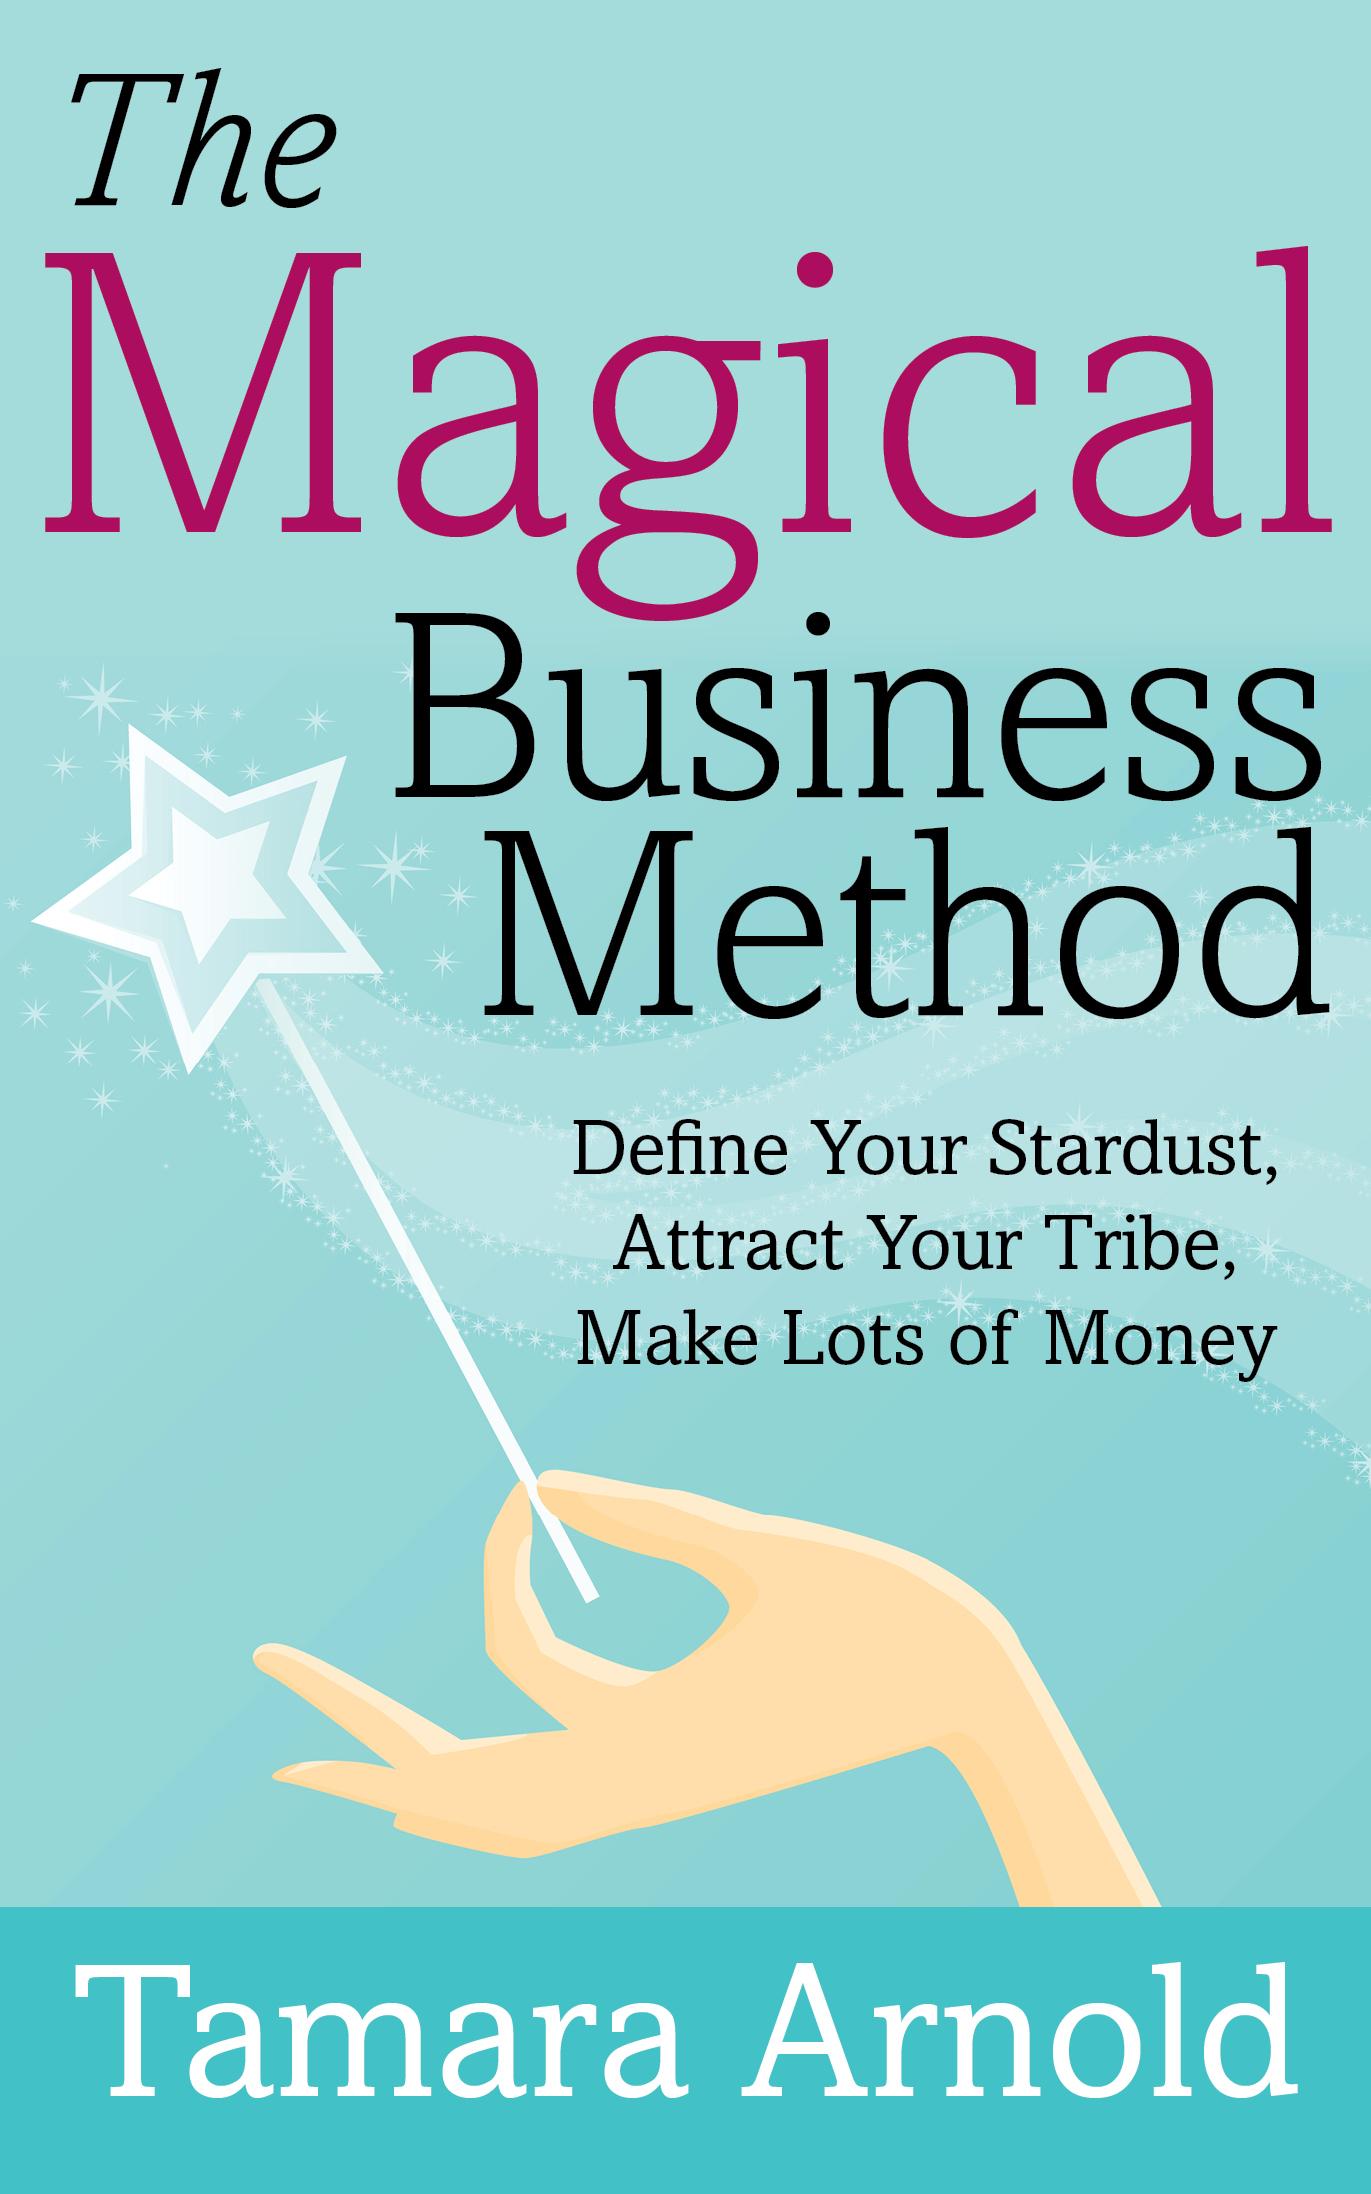 2686214_1543947013430Arnold_The_Magical_Business_Method_PrintCVR_5_x_8.jpg